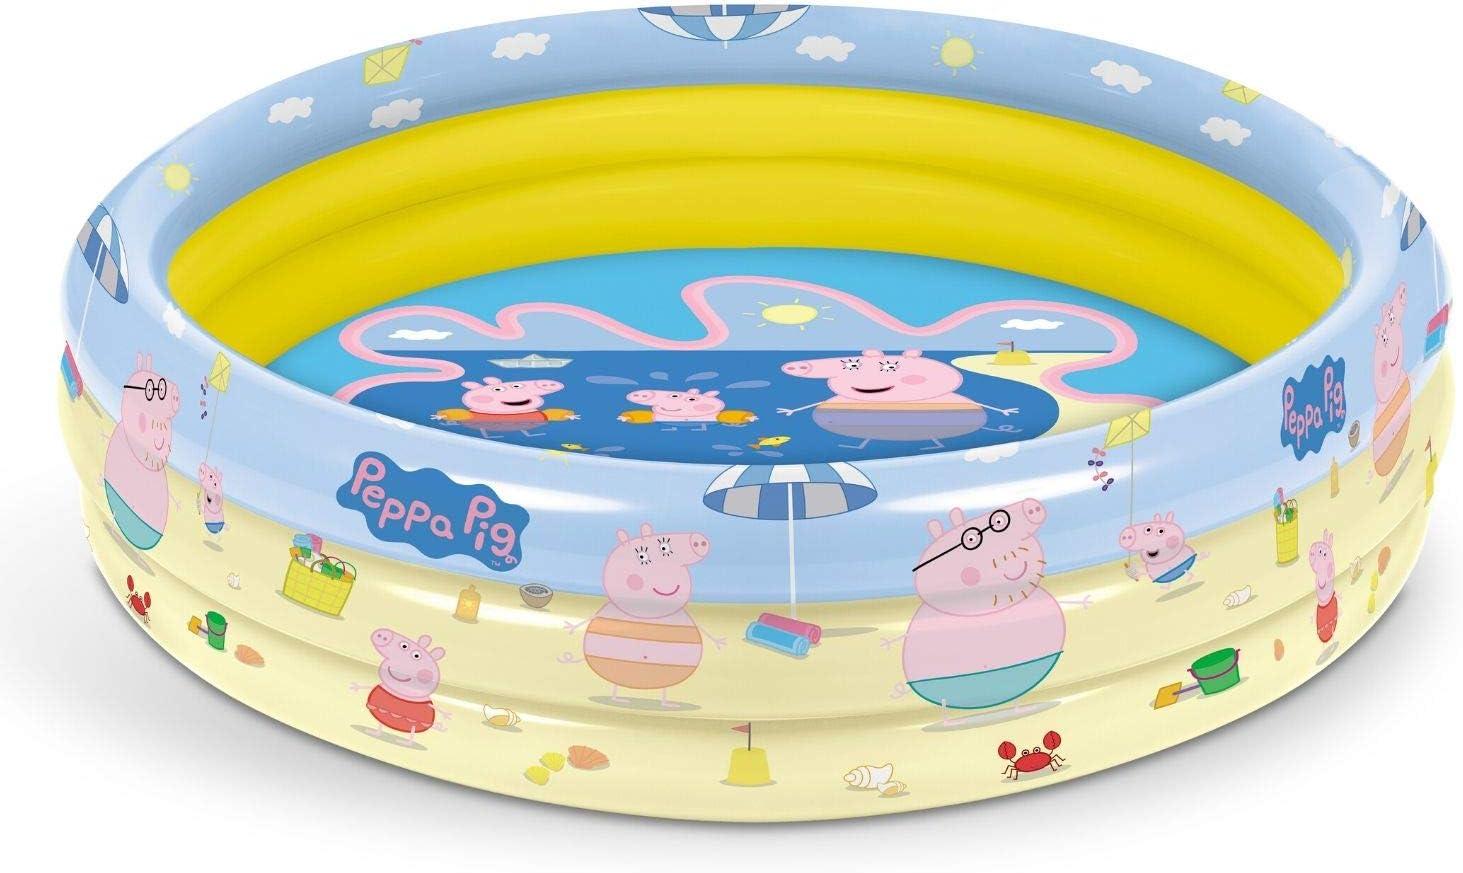 Mondo Toys - Peppa Pig - Piscina Hinchable para niños, 3 Anillas ...